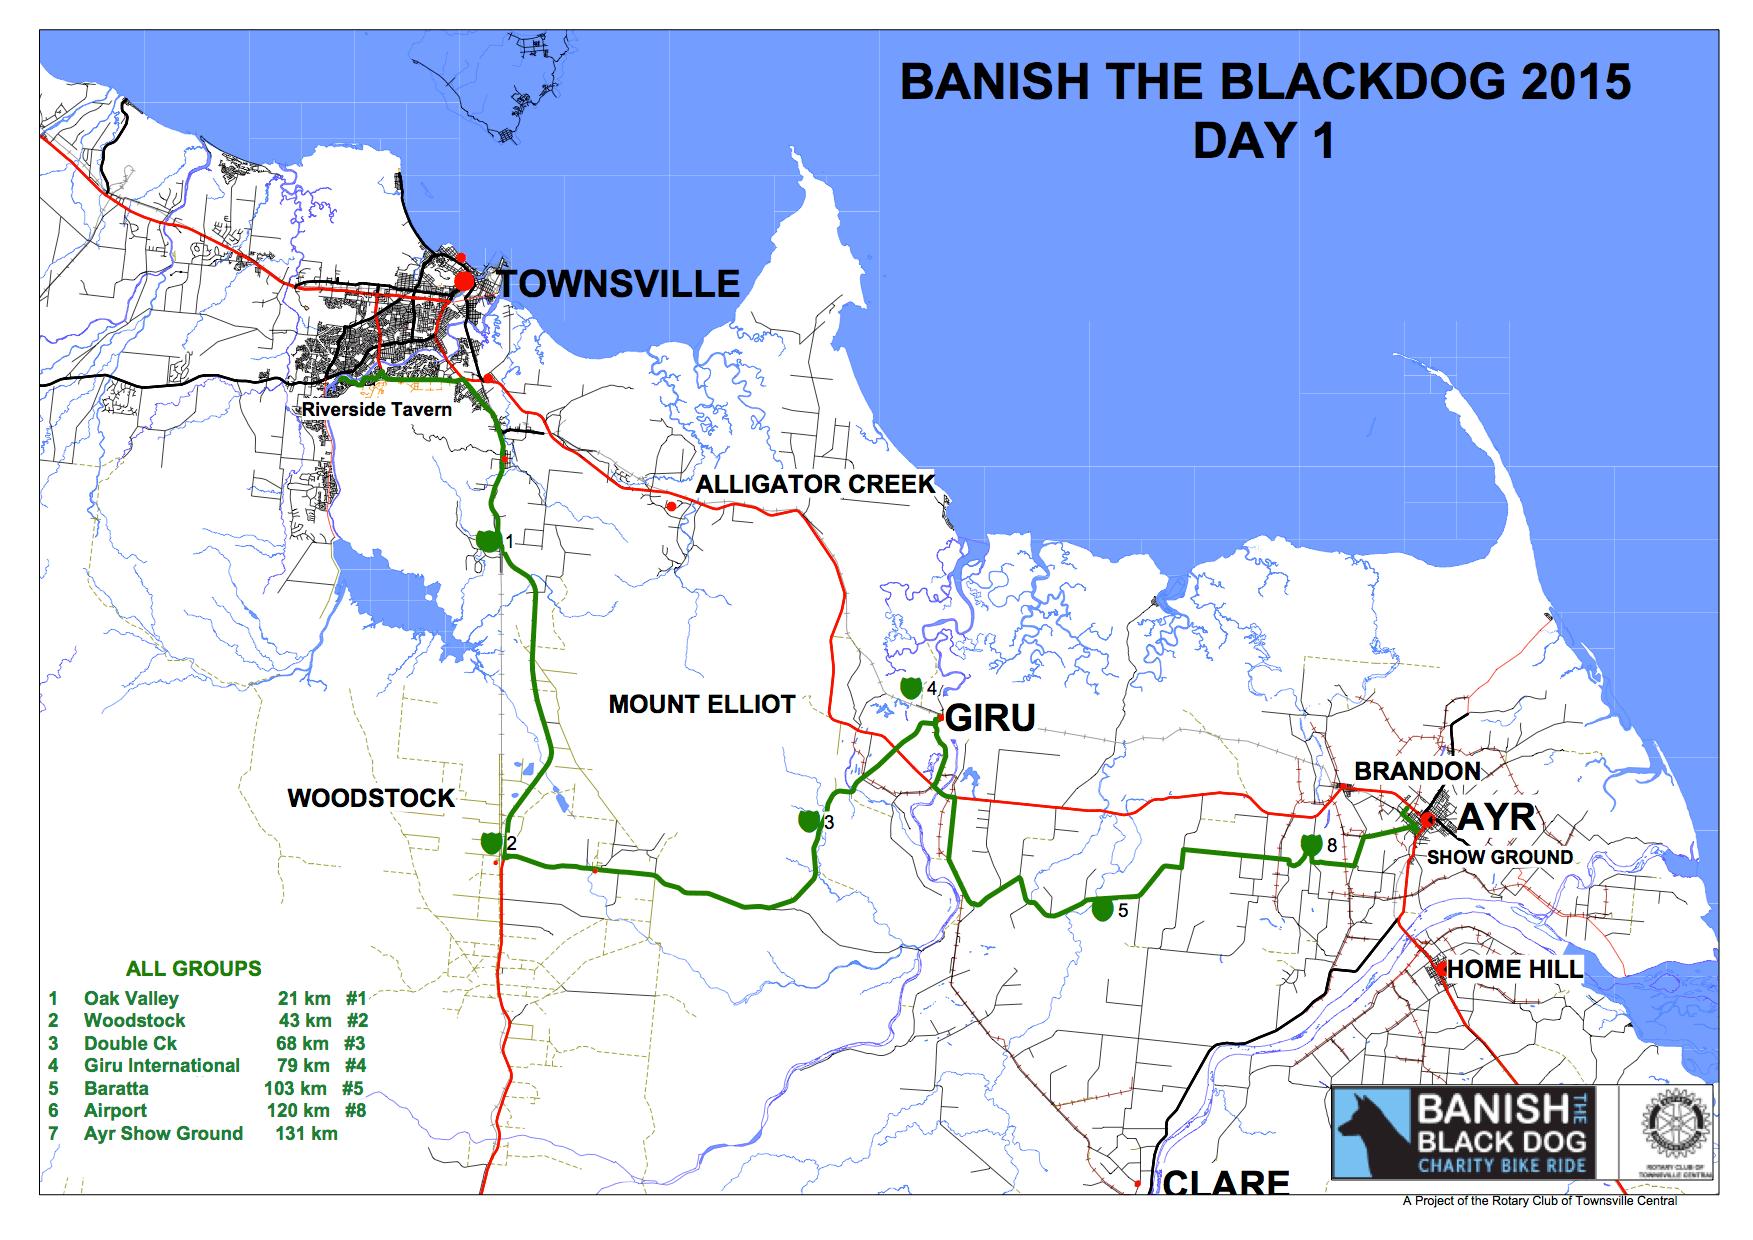 Banish The Black Dog 2015 Map Day 1